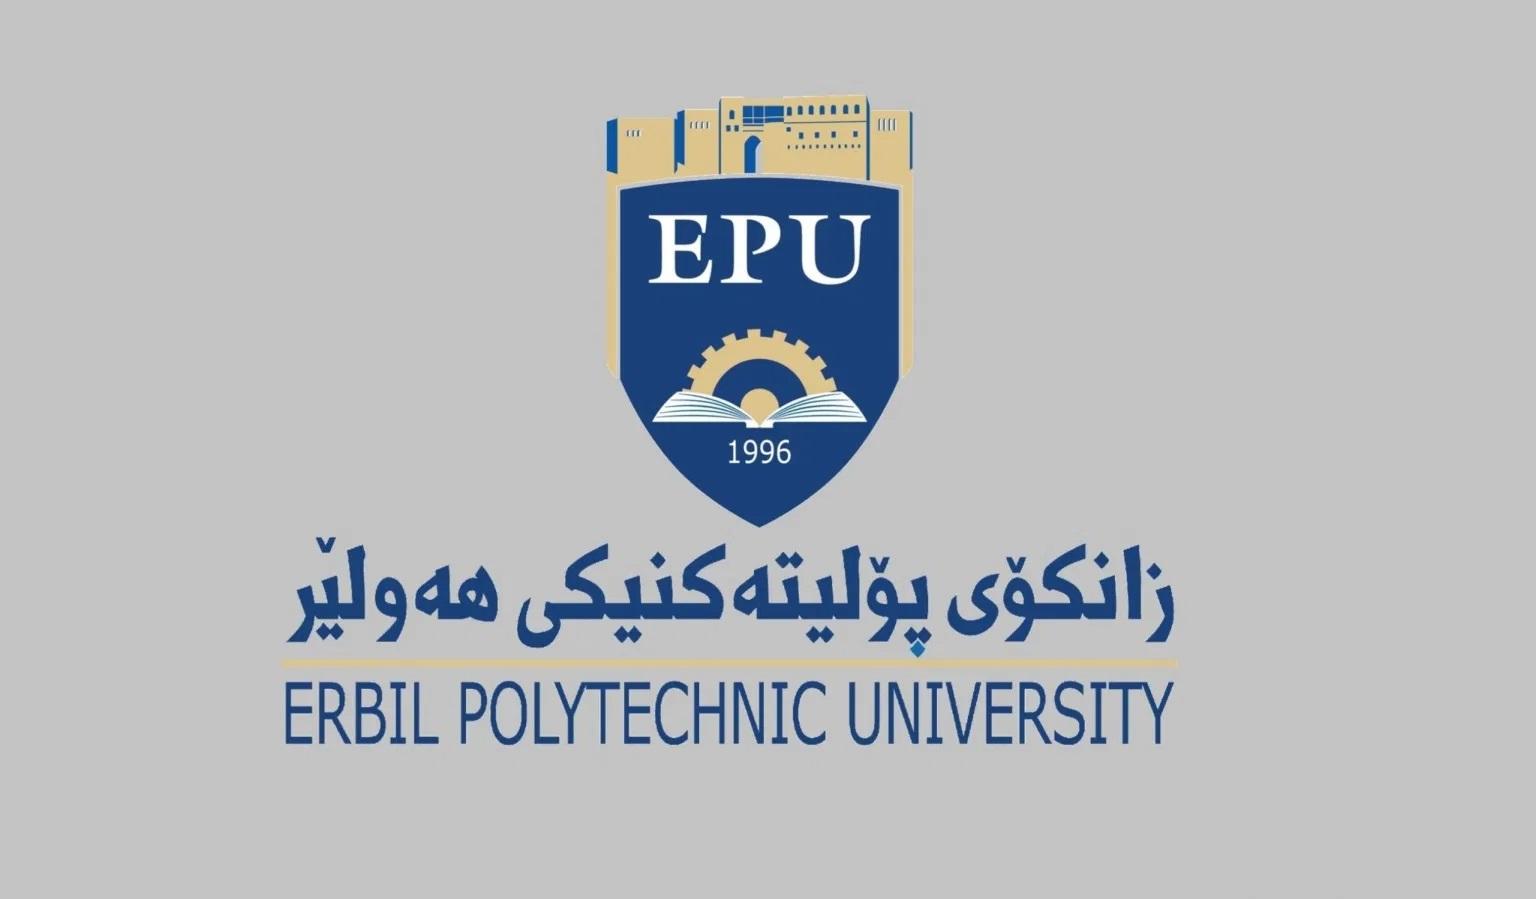 Erbil Polytechnic University  And Technische Hochschule Mittelhessen University Of Applied Sciences Will Deliver An online Symposium